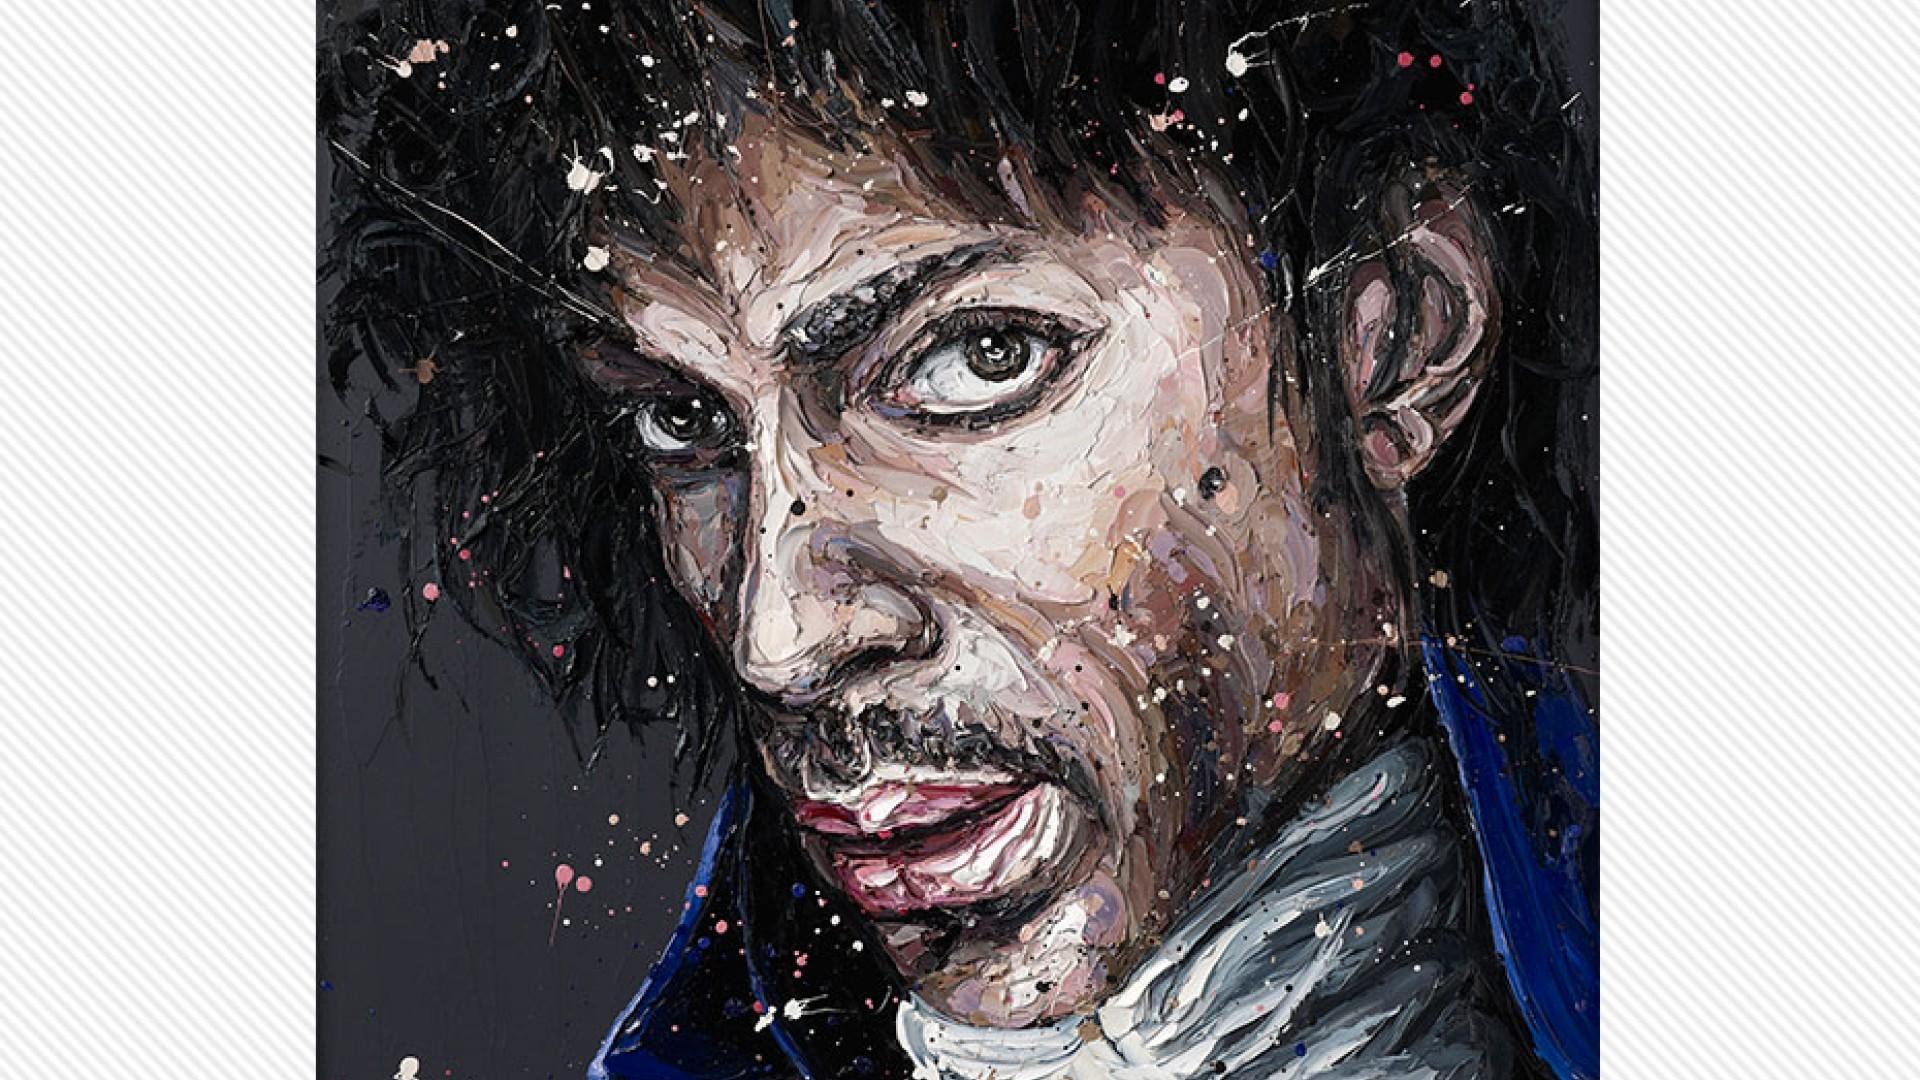 Prince by Paul Oz